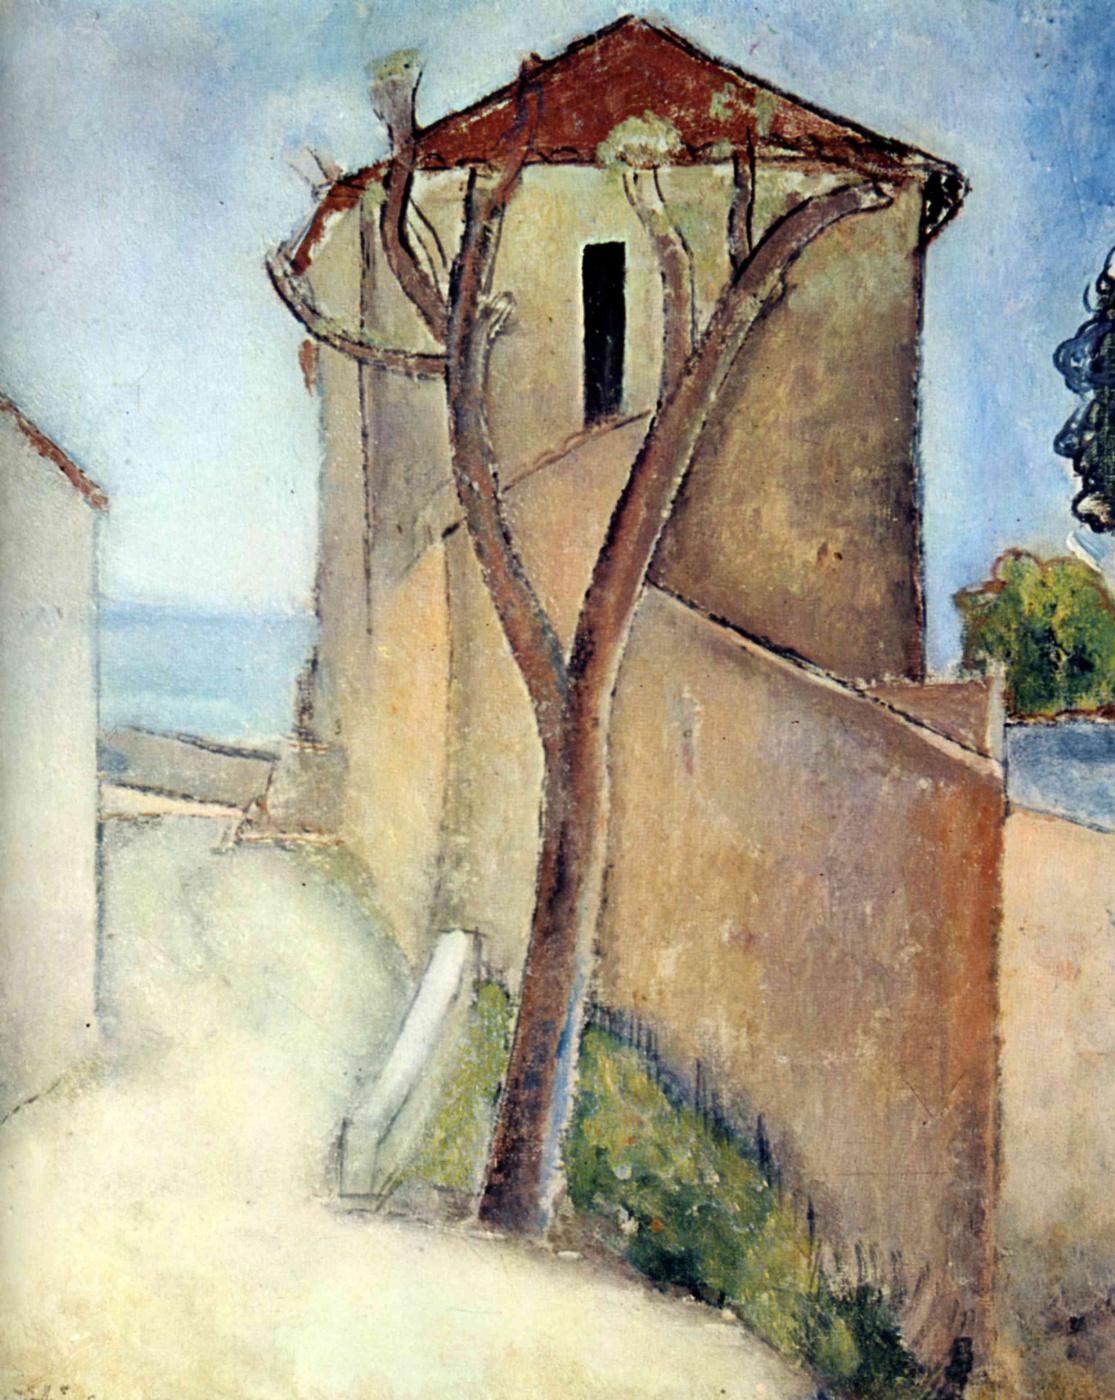 Amedeo Modigliani. Tree house